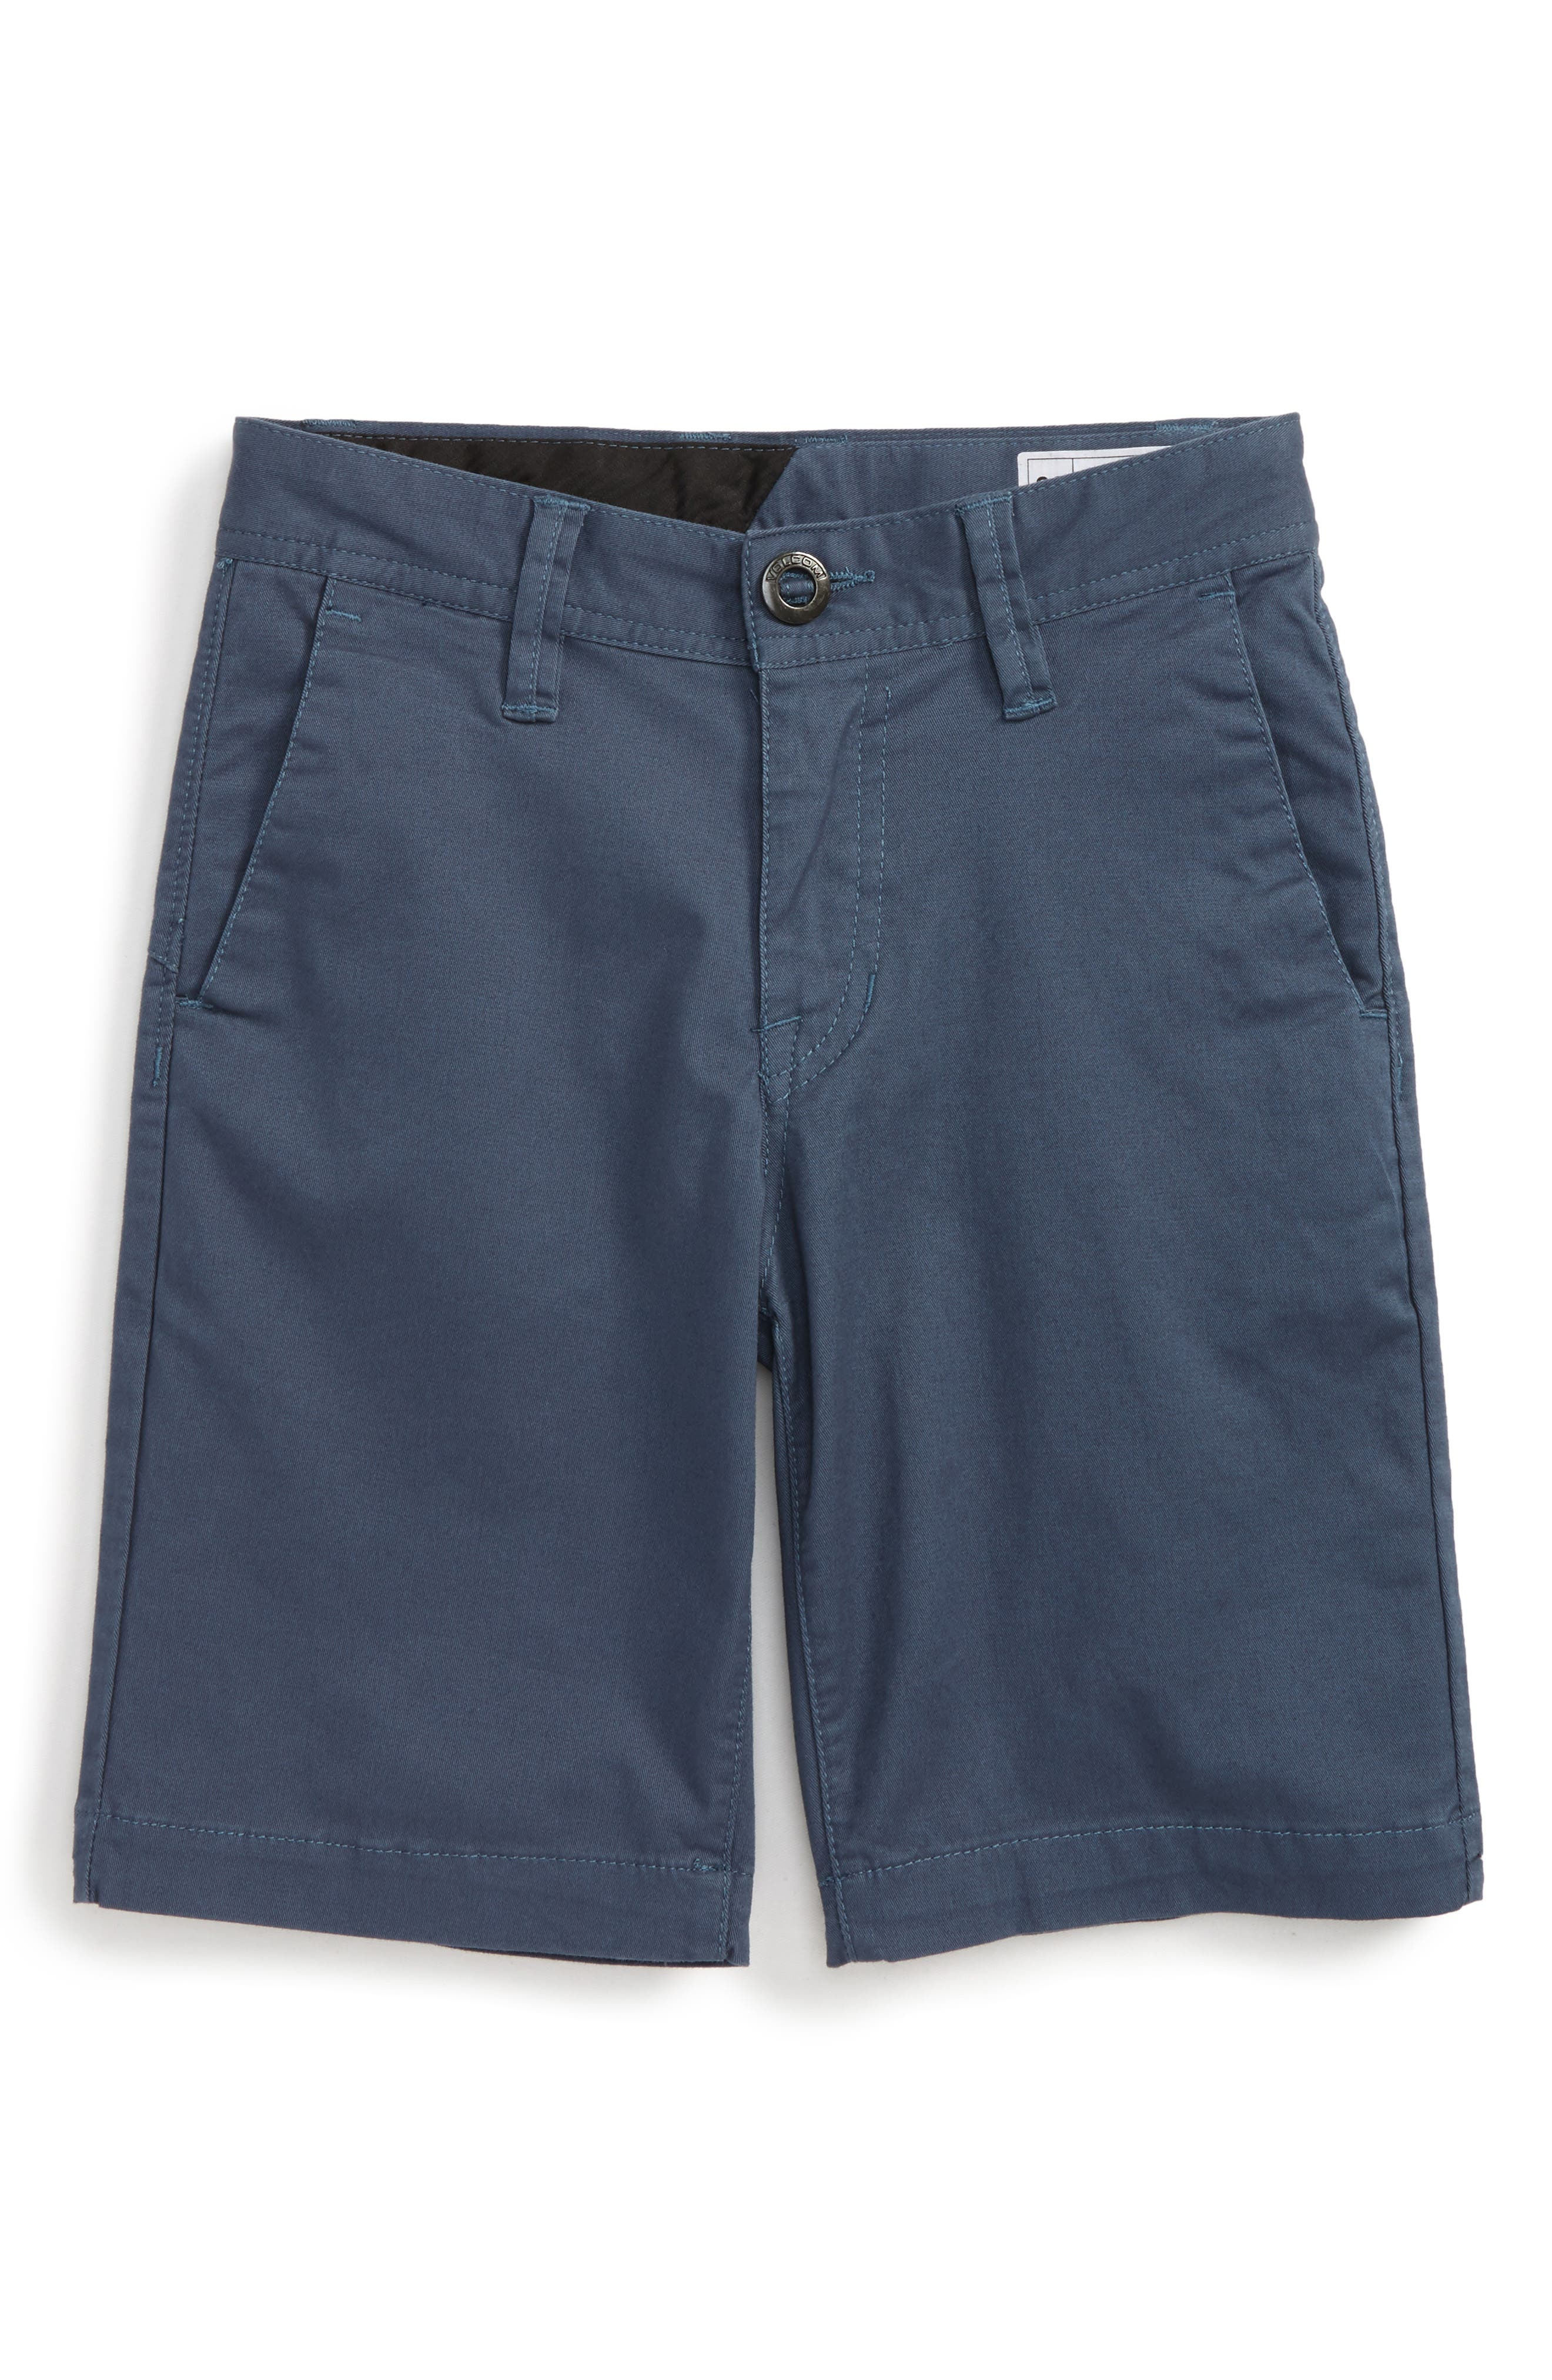 Volcom Cotton Twill Shorts (Toddler Boys, Little Boys & Big Boys)